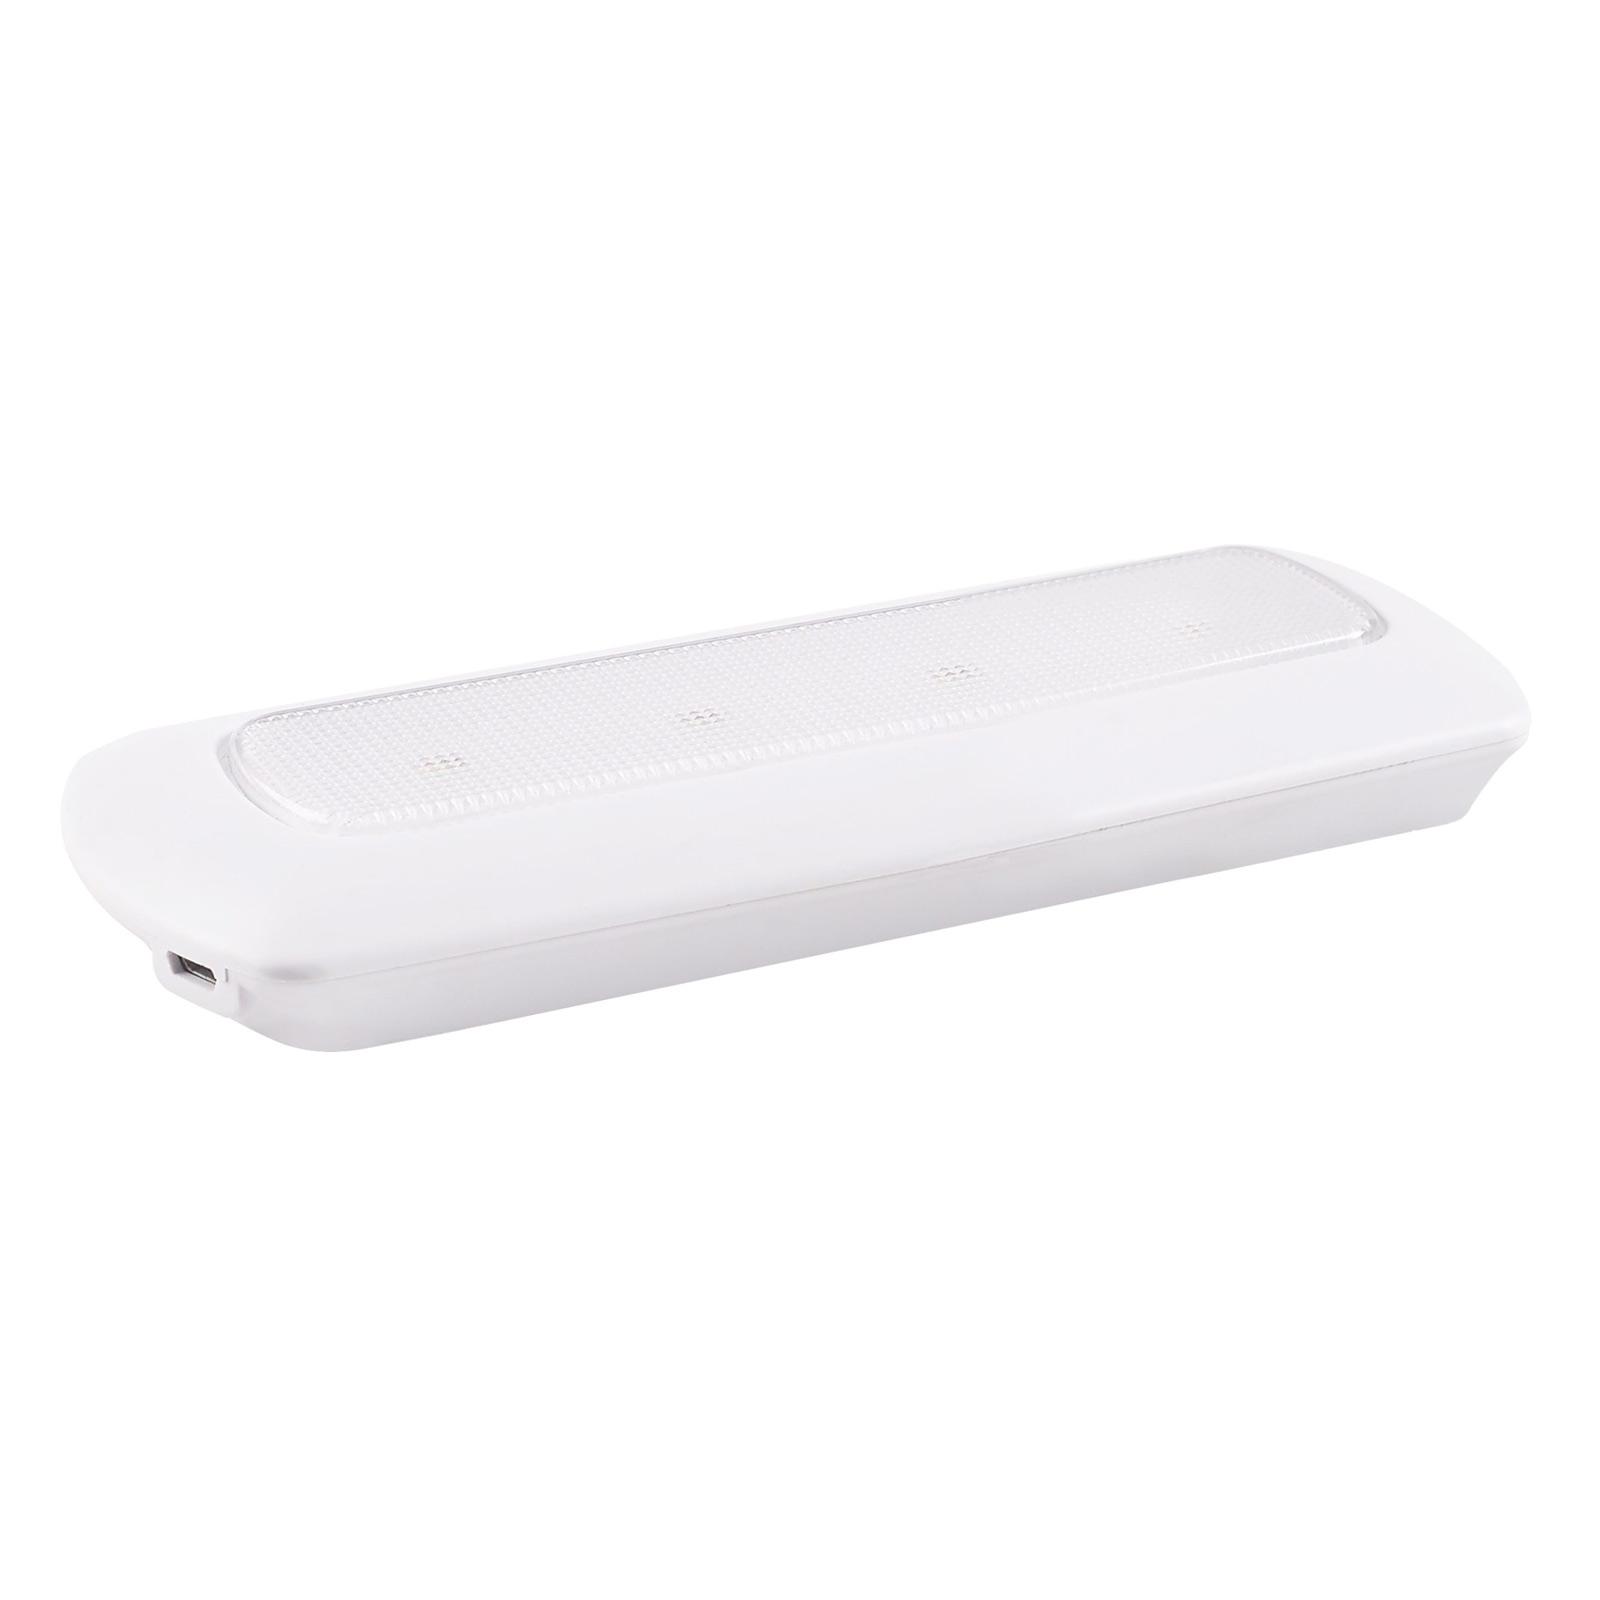 Mobina Push 15 LED light with battery_6520390_1